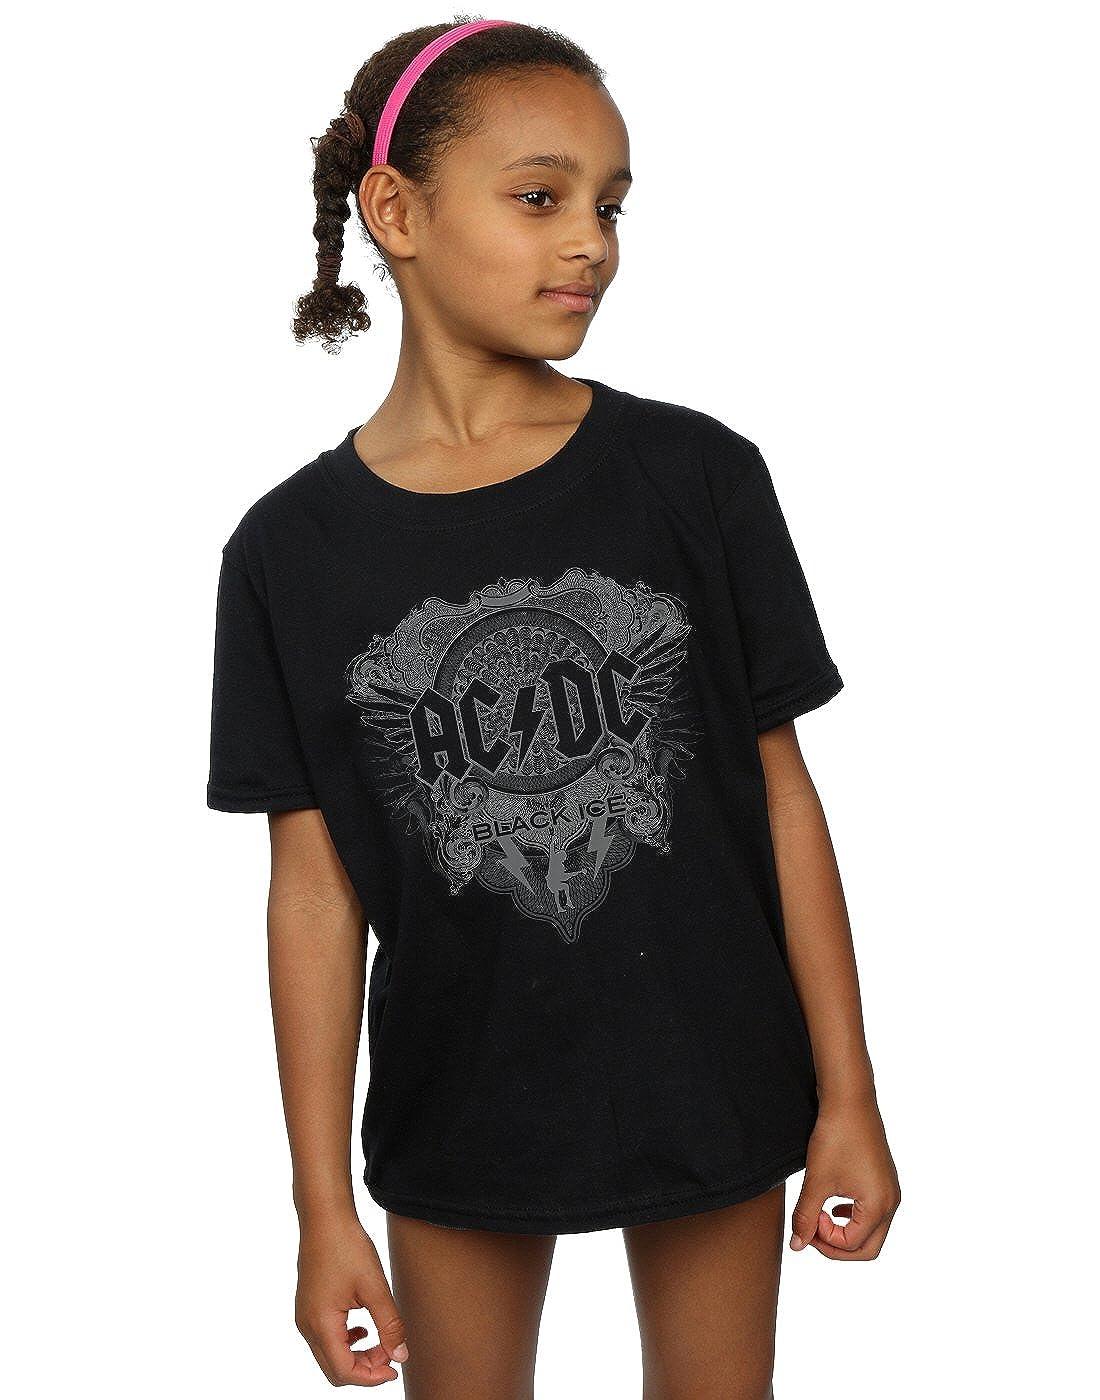 AC/DC Girls Black Ice T-Shirt Absolute Cult